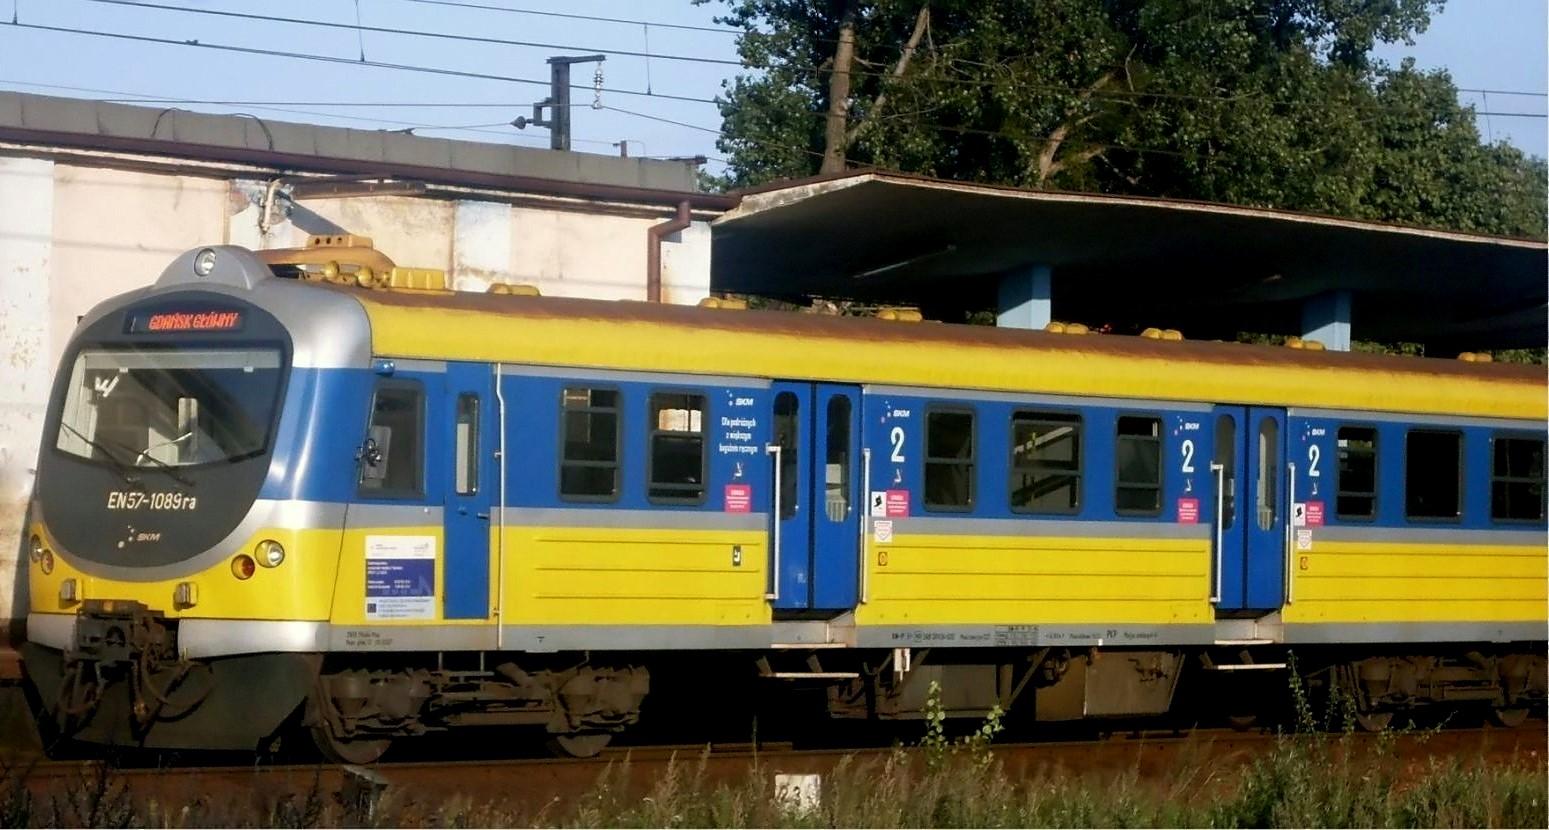 File:EN57-1089ra motor coach of Trójmiejska SKM.jpg ...